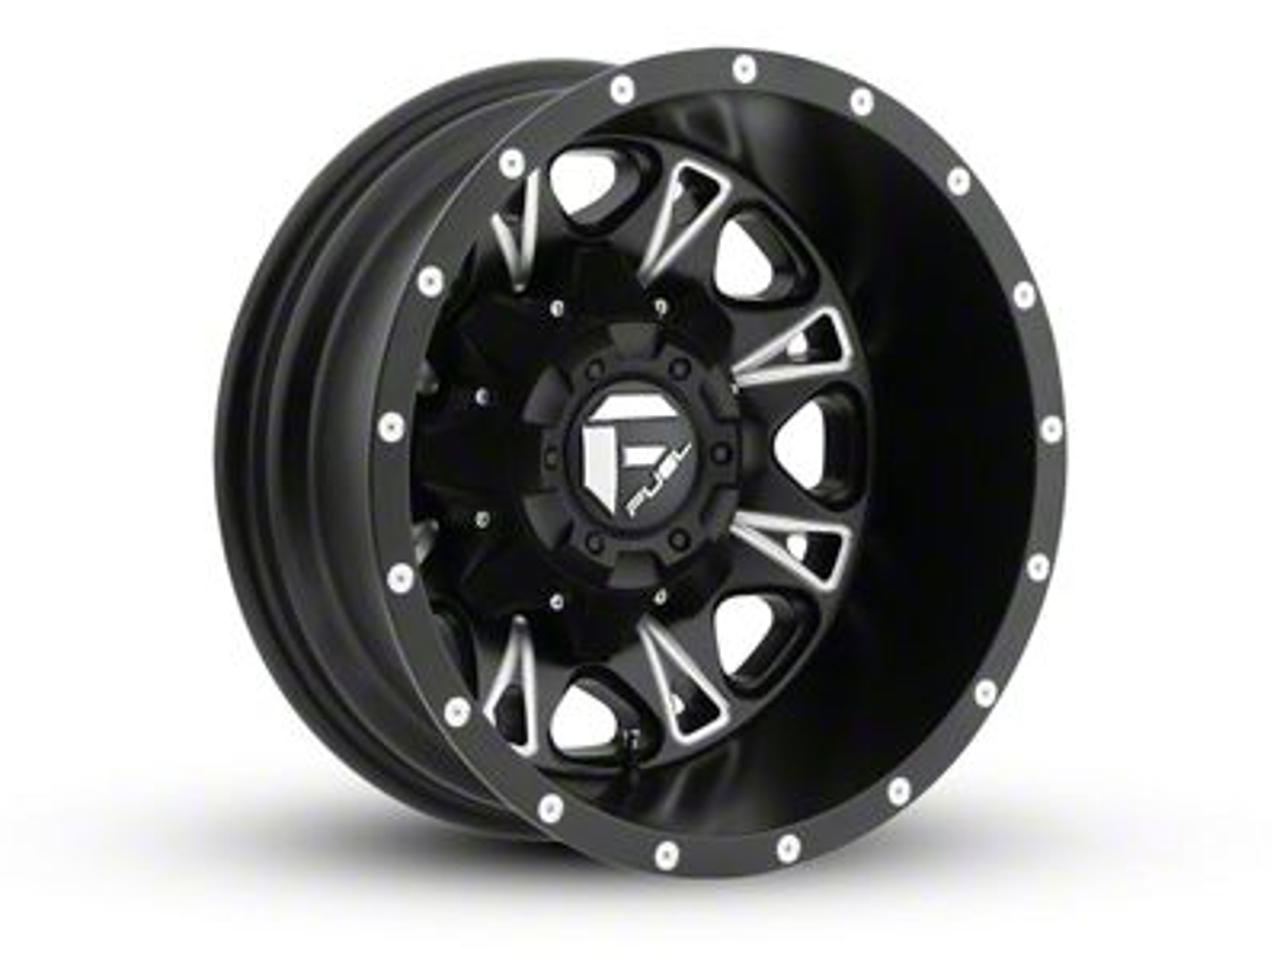 Fuel Wheels Throttle Black Milled 5-Lug Wheel - 20x10 (02-18 RAM 1500, Excluding Mega Cab)